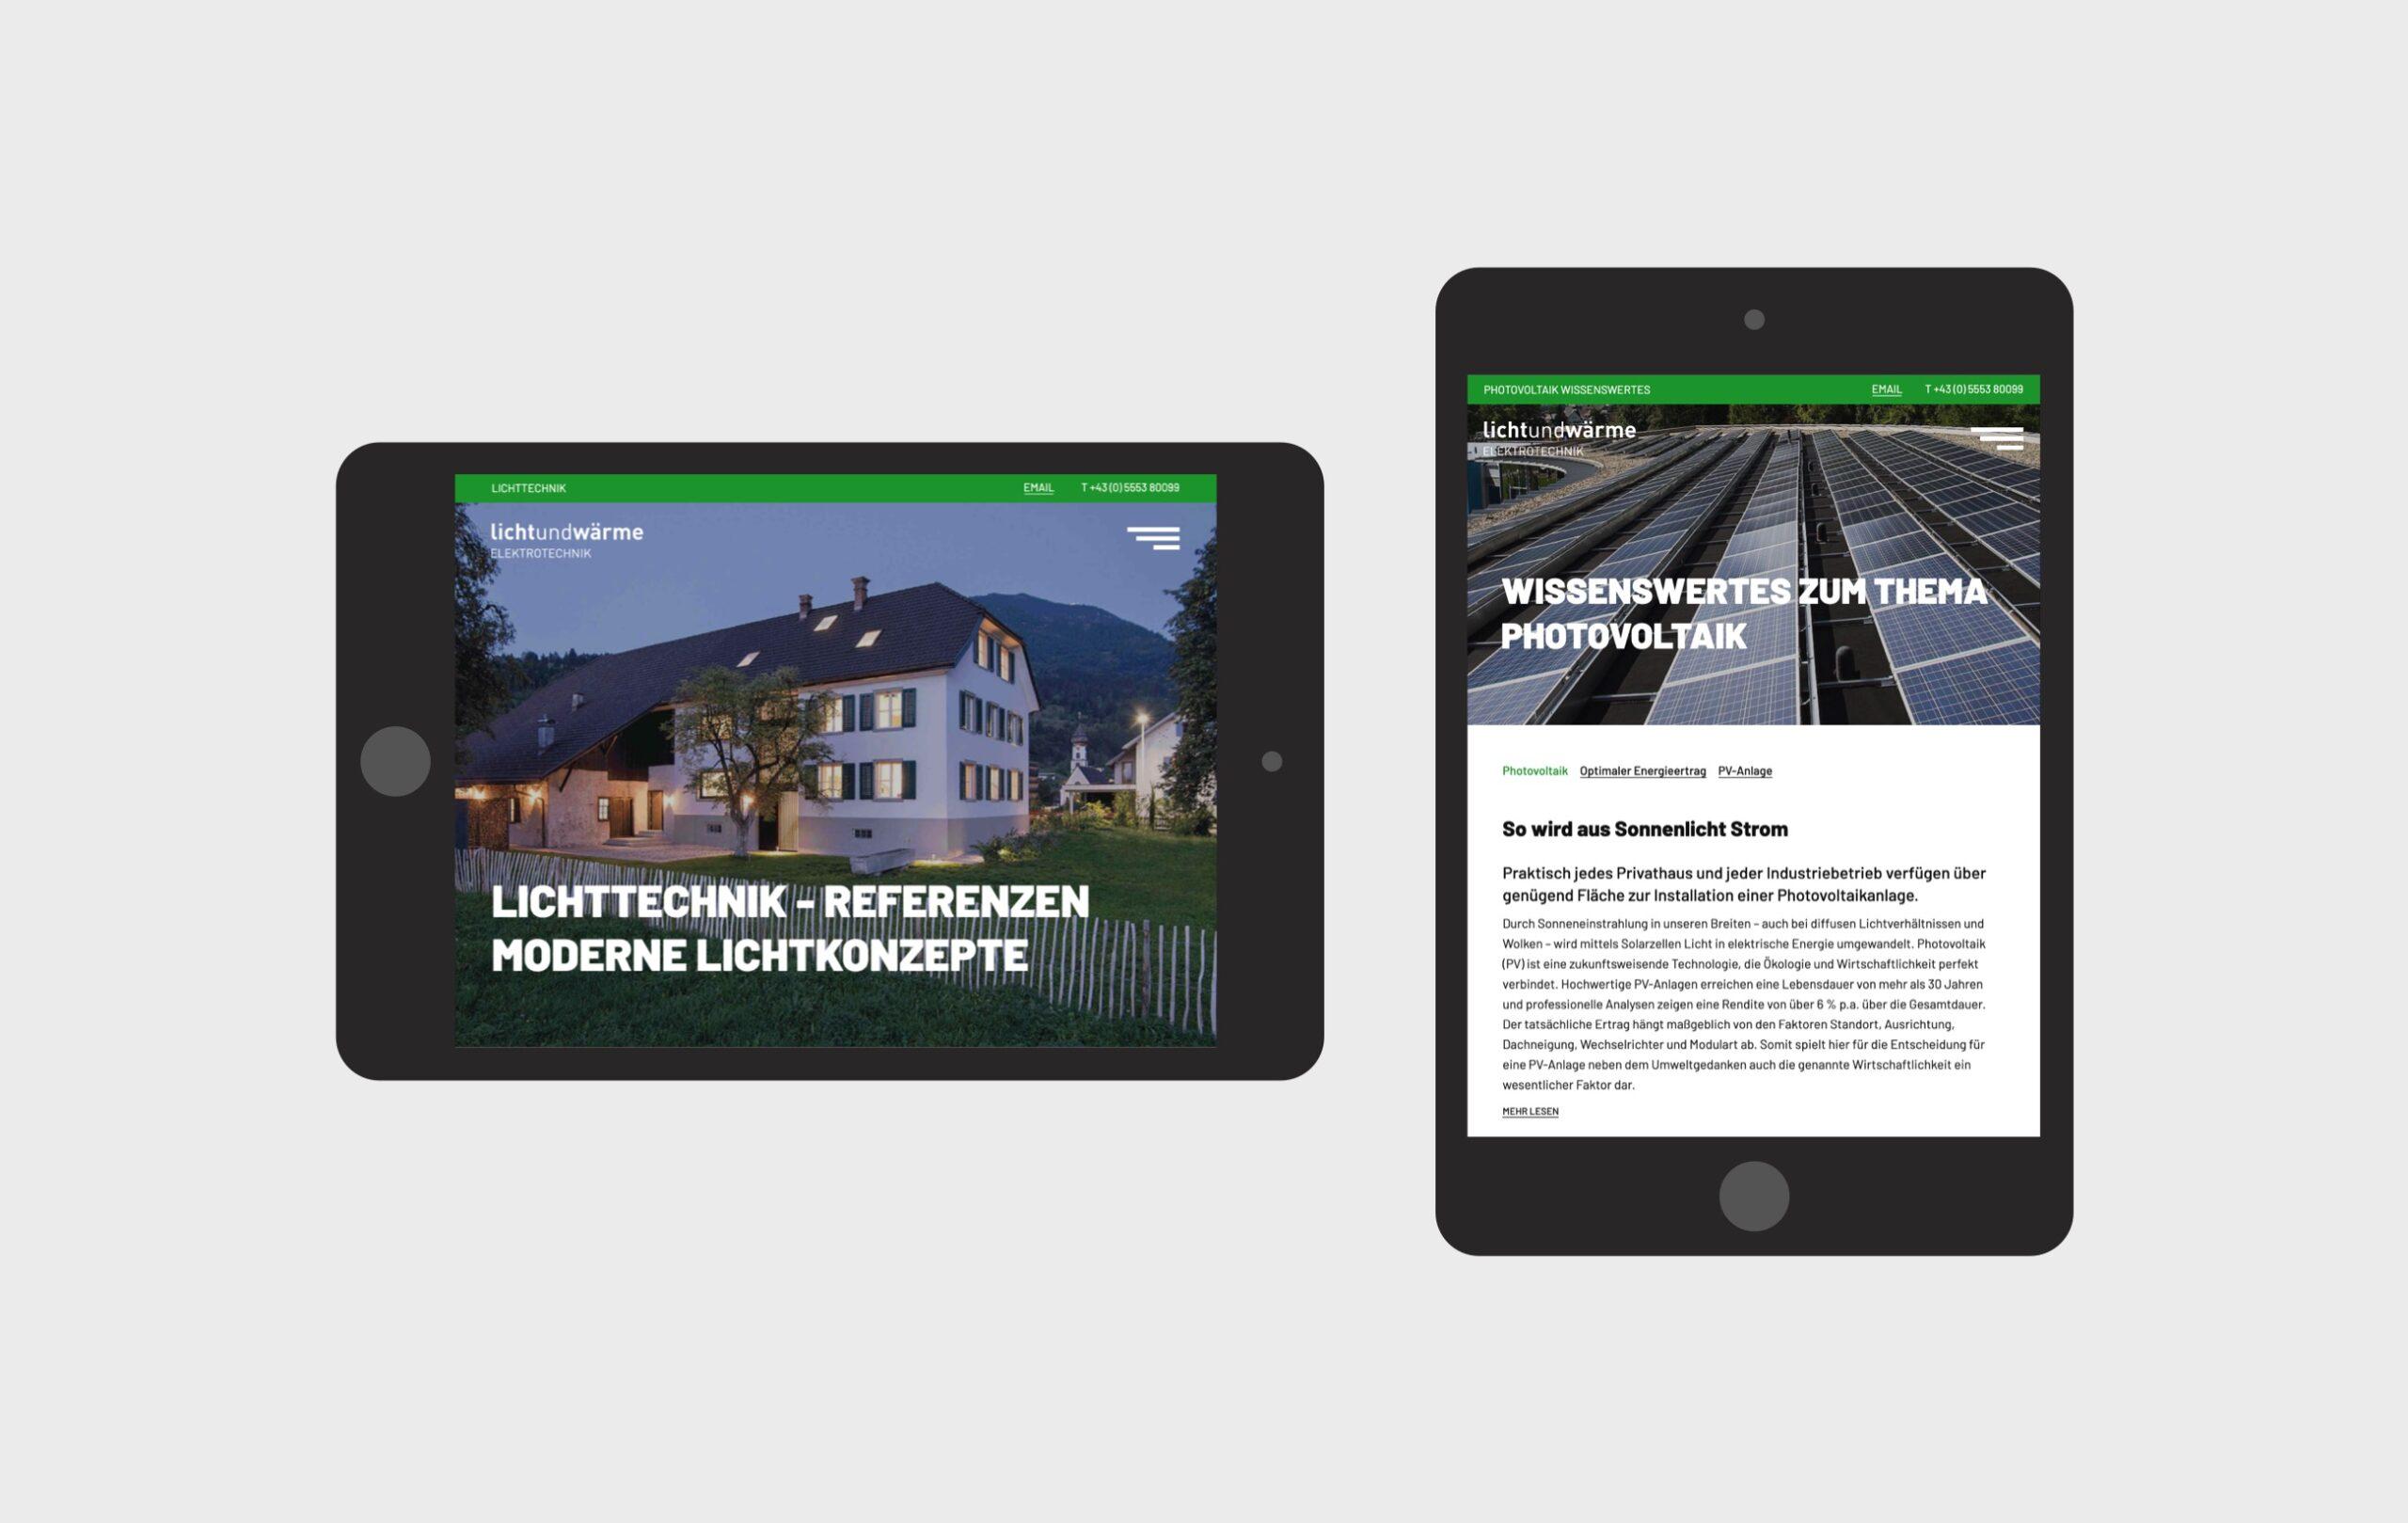 Lichtundwärme website tablet views